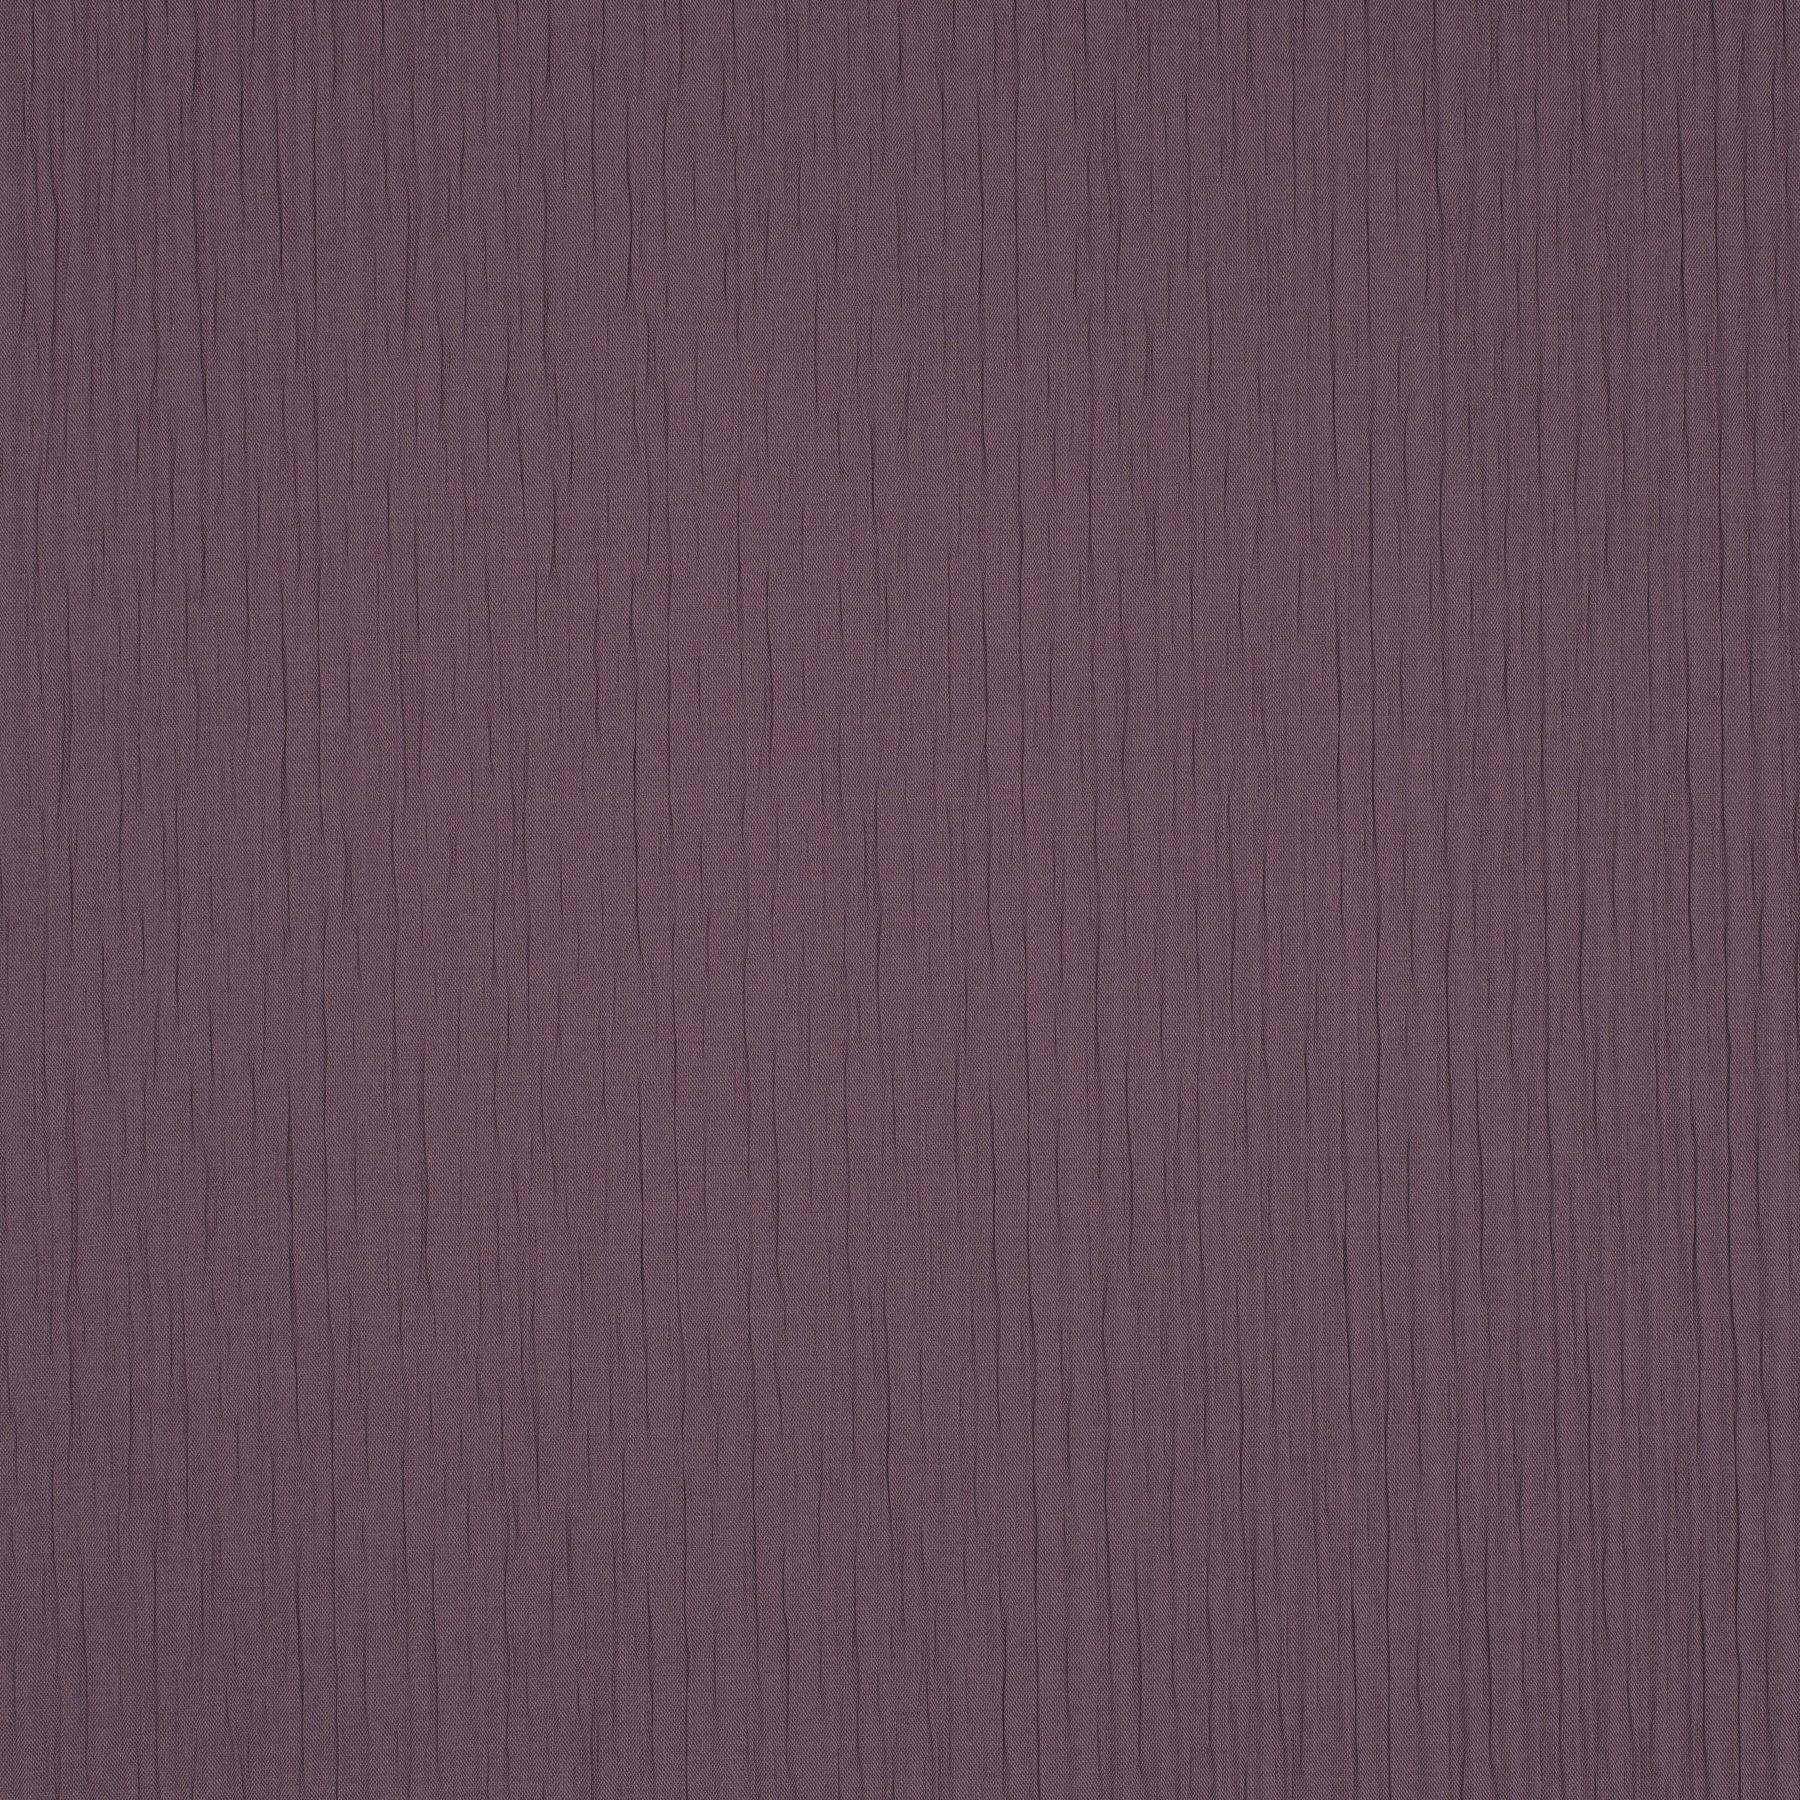 decoration fabric satin crash 1 6829 088 jab anstoetz. Black Bedroom Furniture Sets. Home Design Ideas